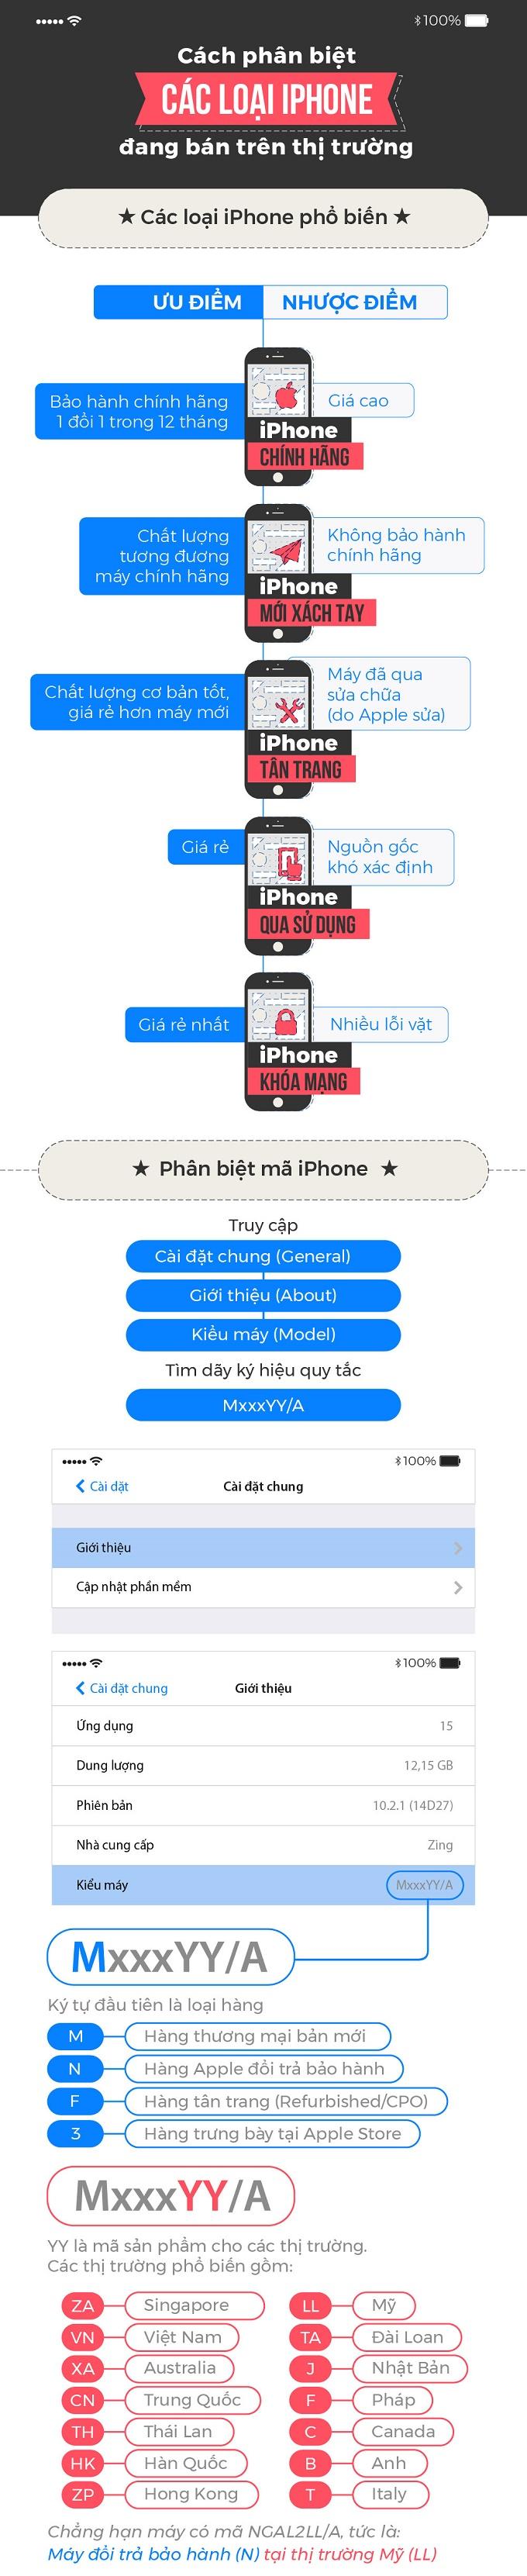 phân biệt iPhone